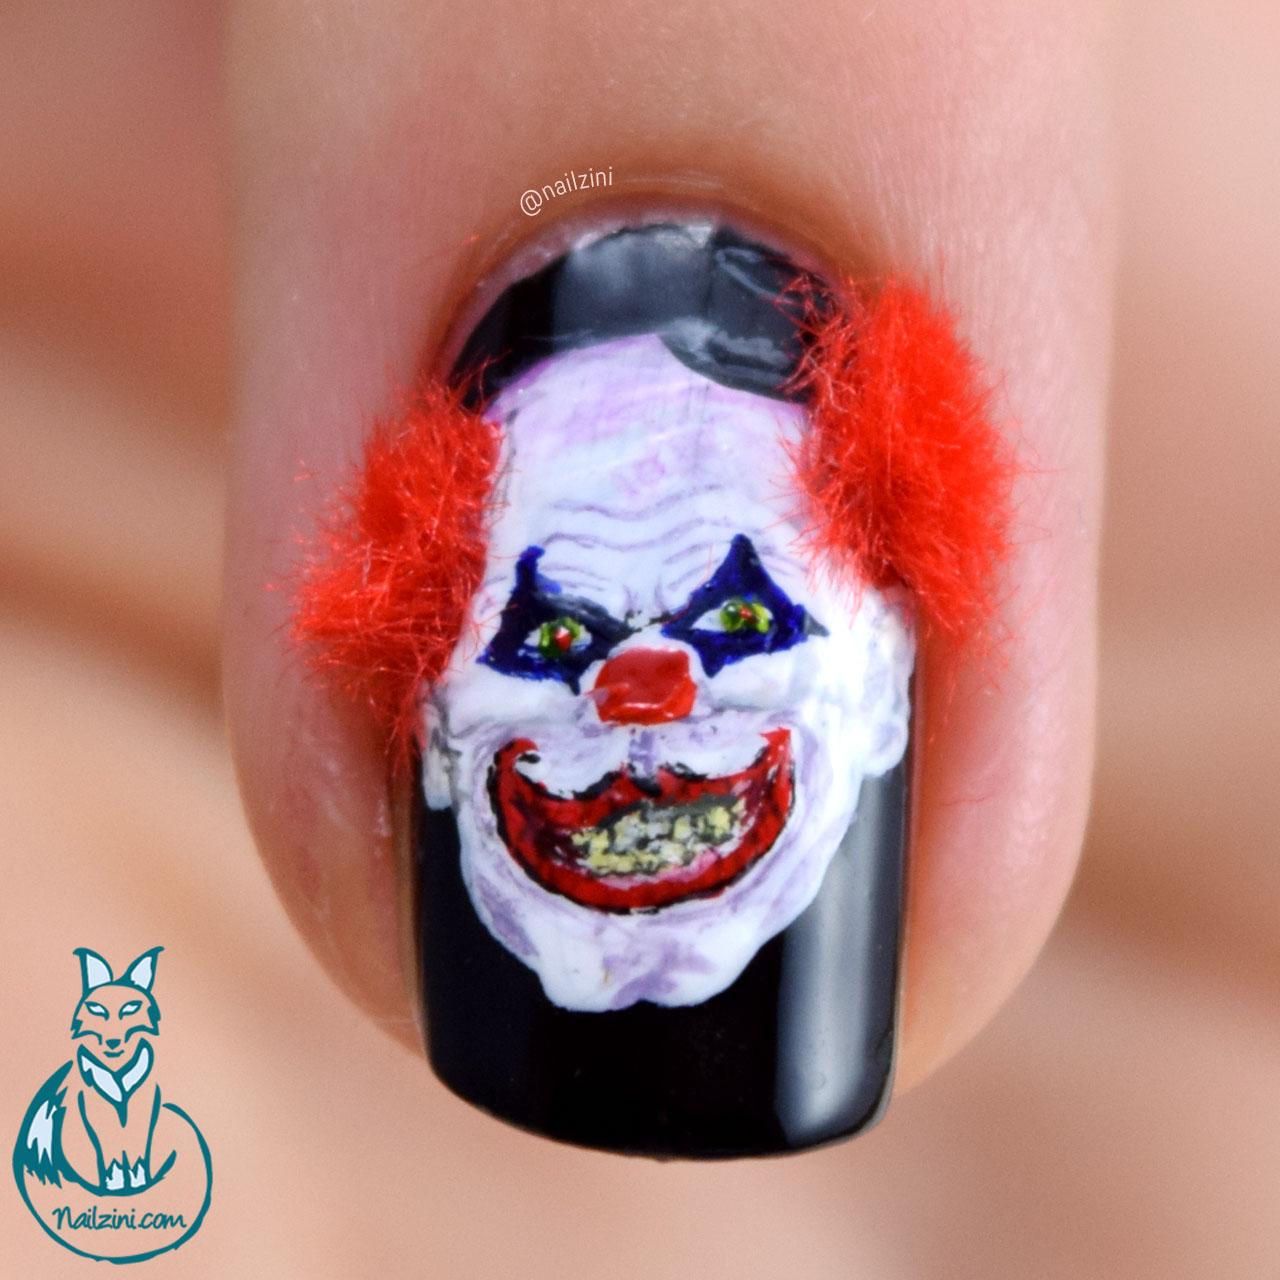 Creepy Clown Nail Art | Nailzini: A Nail Art Blog